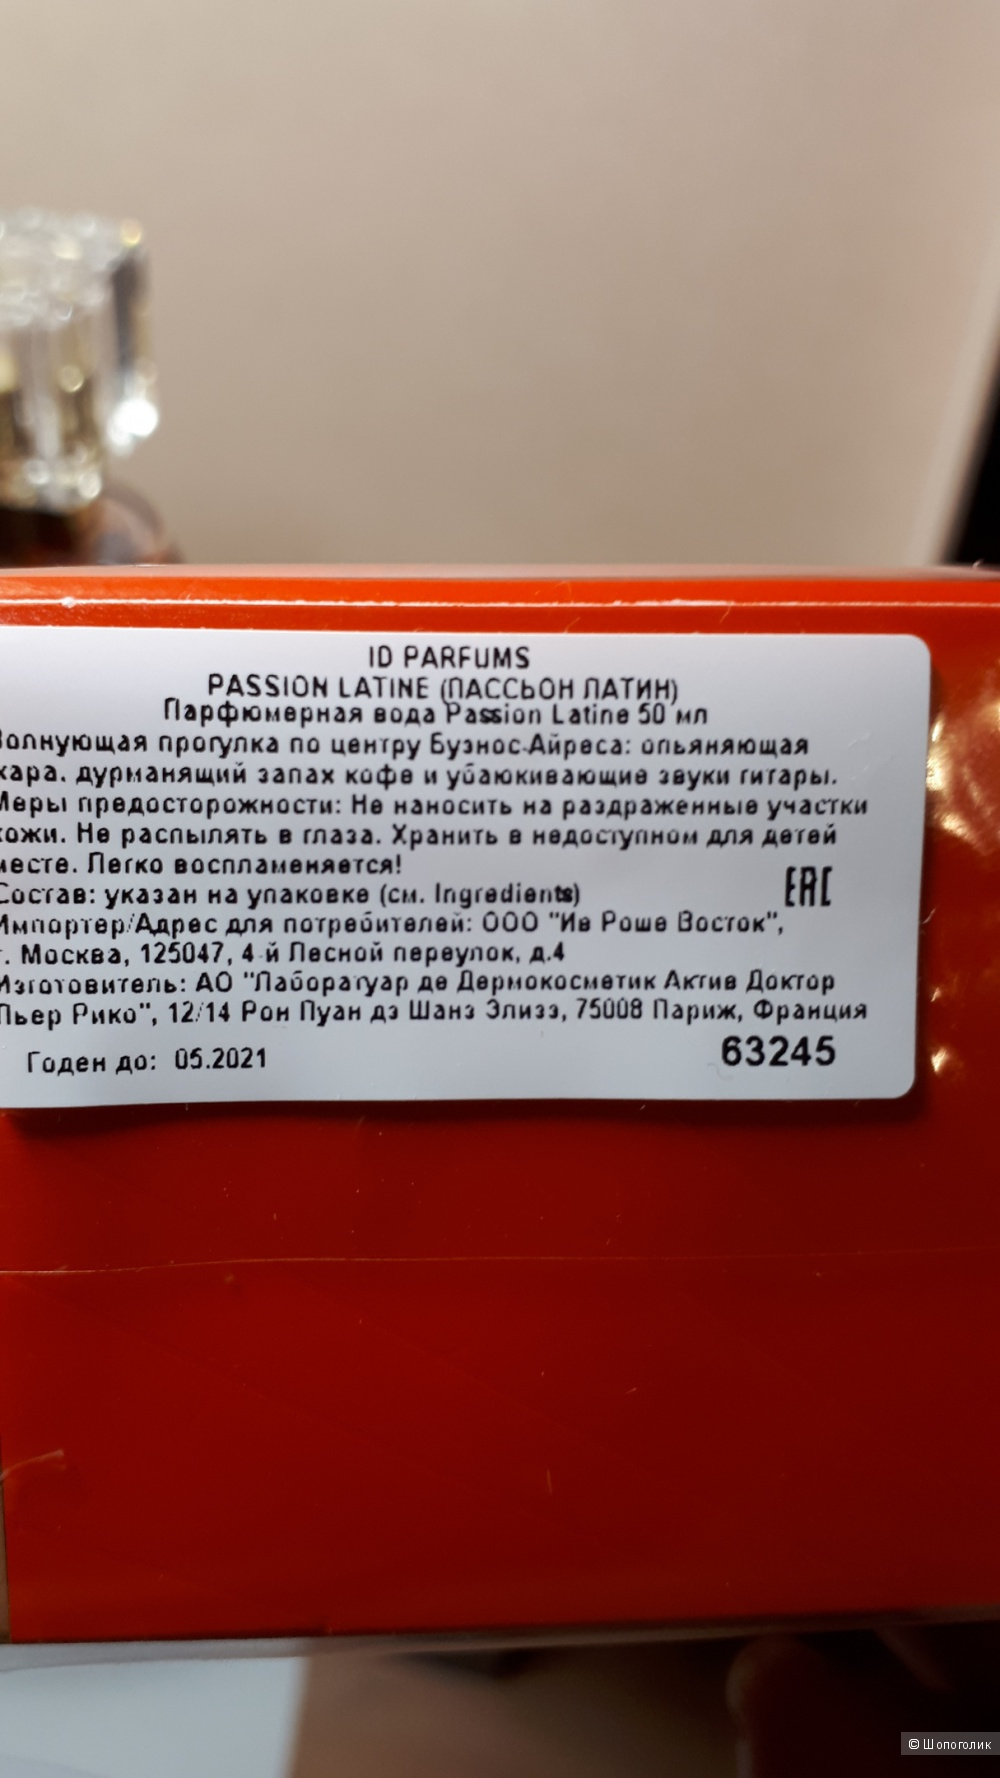 Passion Latine, ID Parfums,50 мл